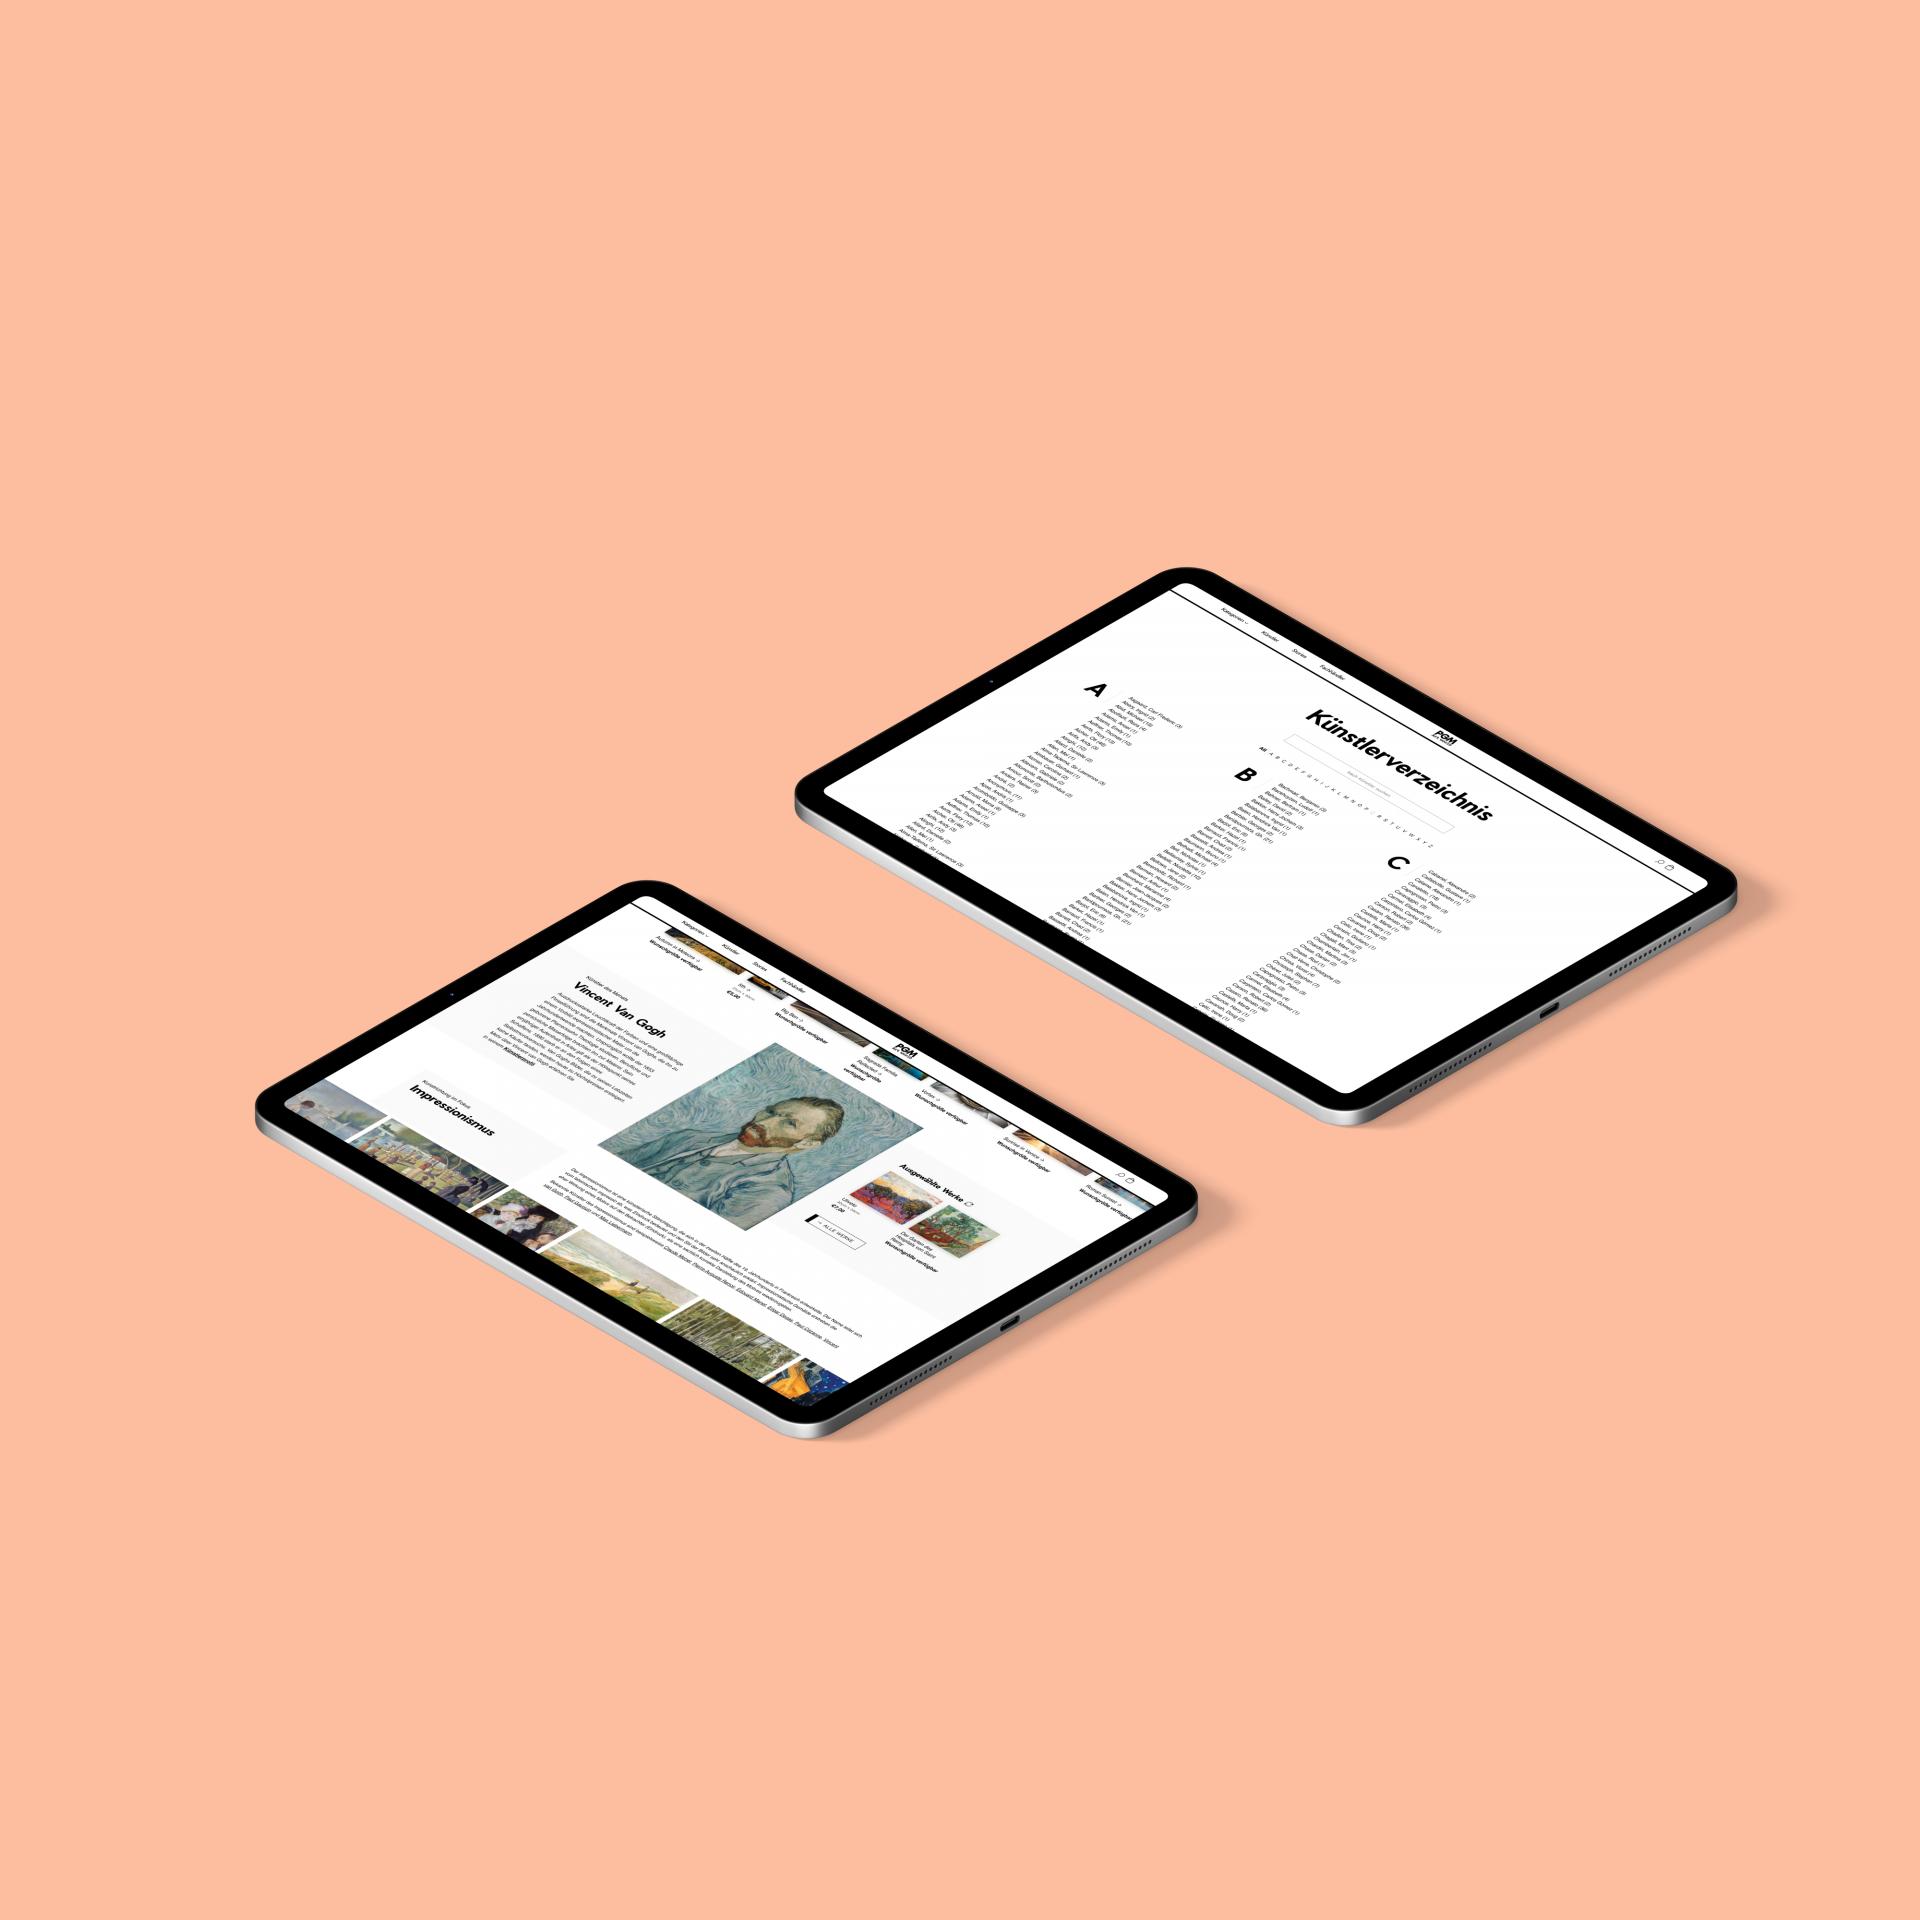 pgm artworld shopify art shop case study tablet mockups